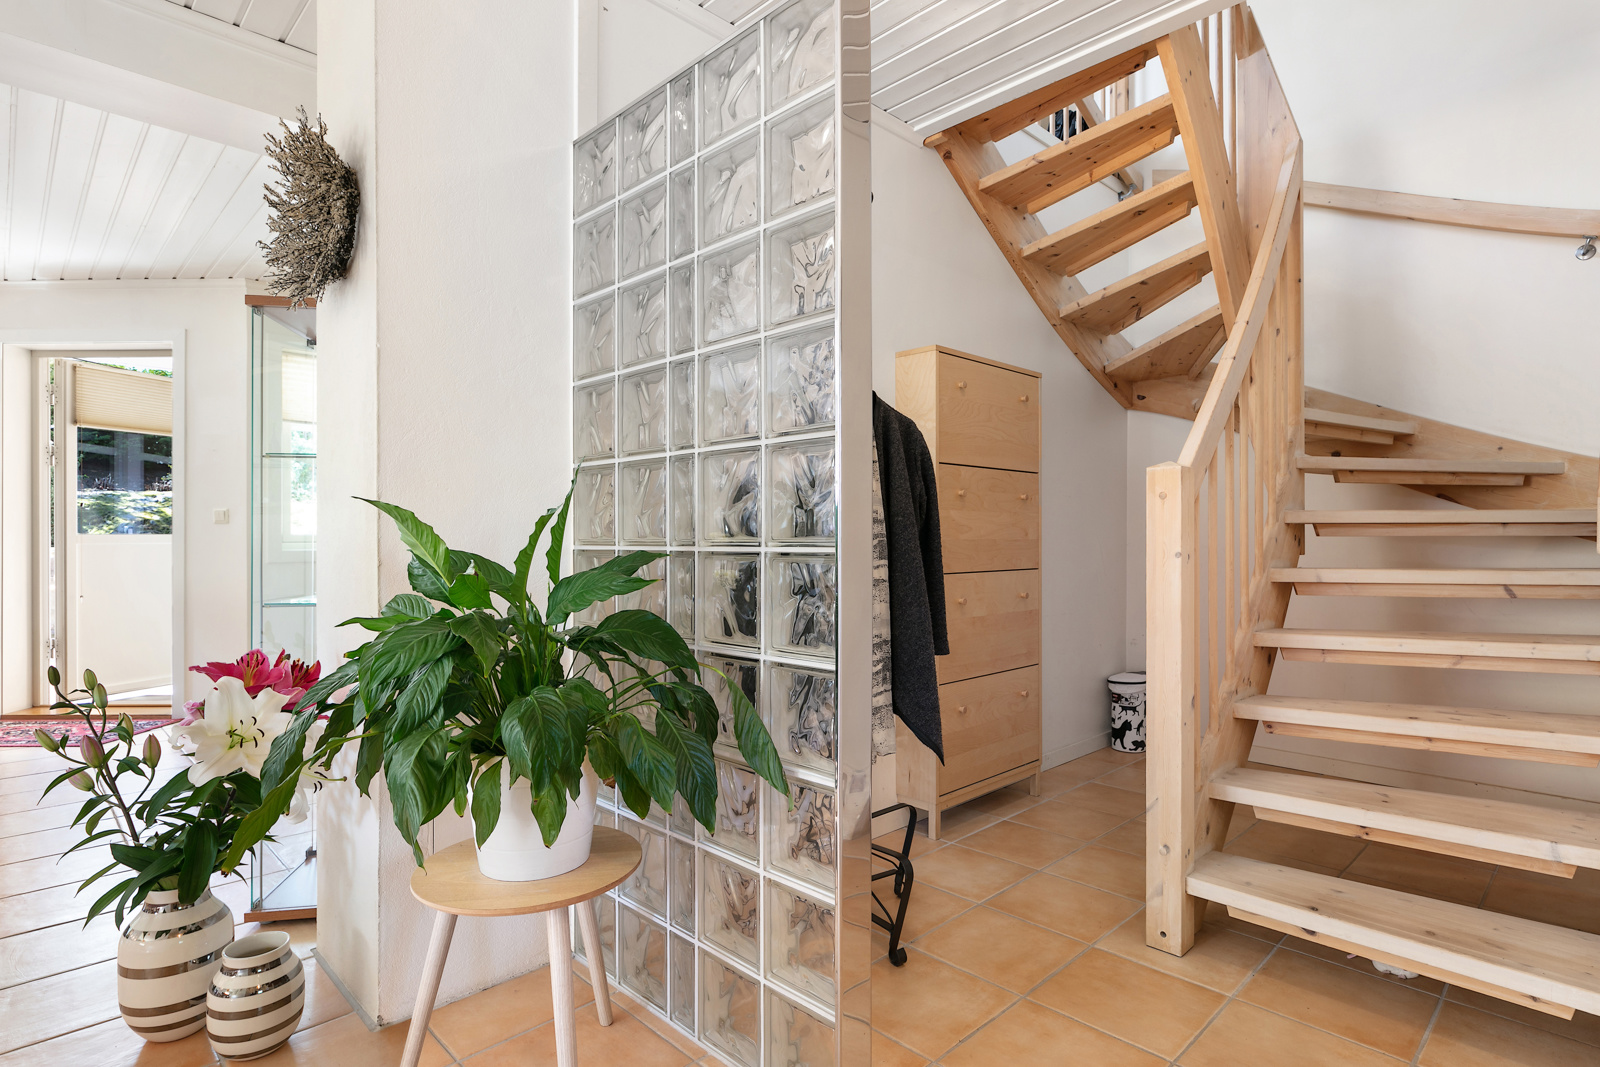 Trappegang- mulighet for oppbevaring under trappen